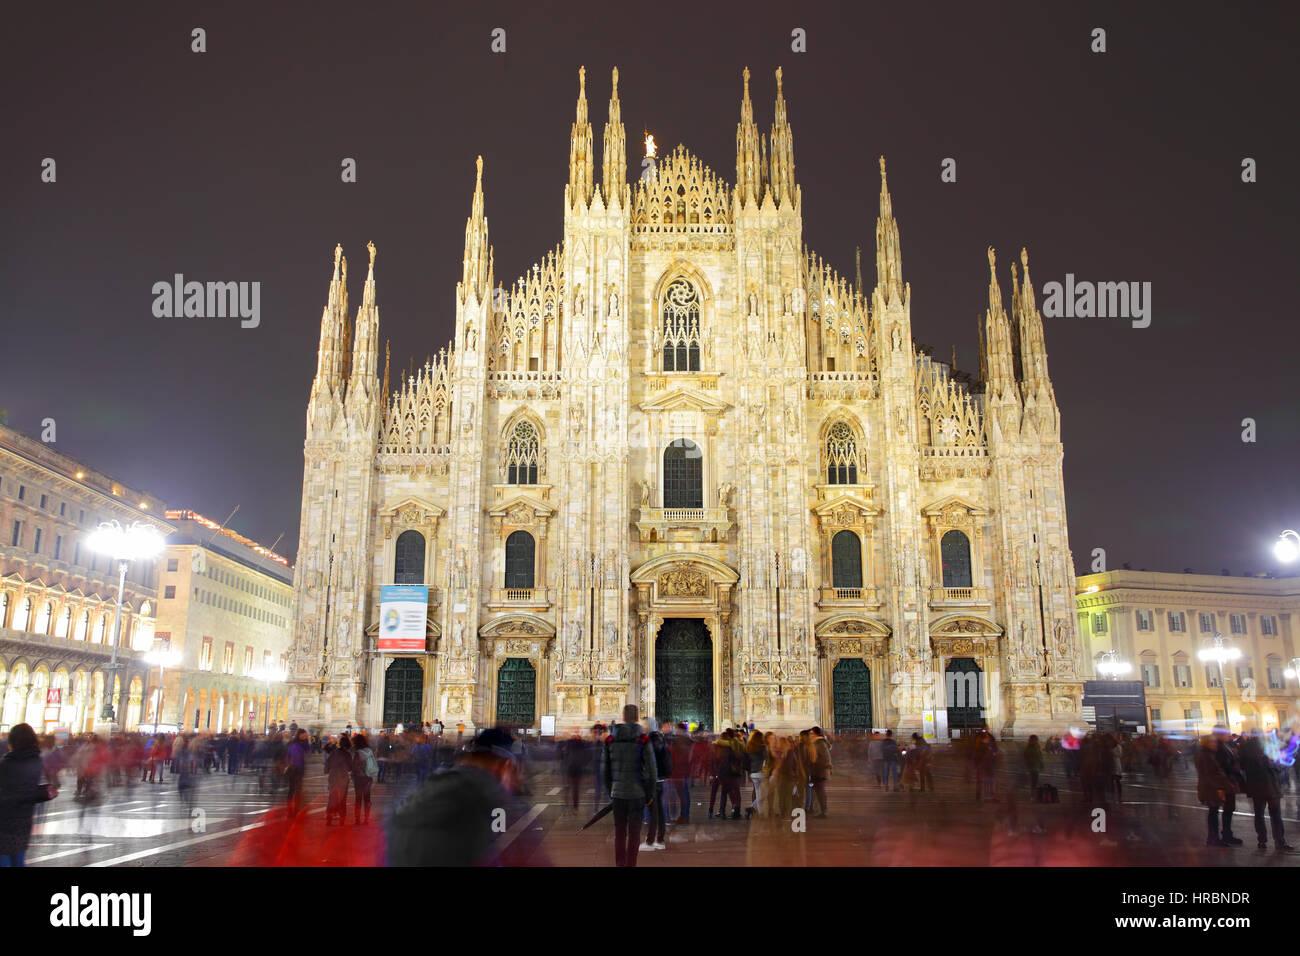 Milan Cathedral (Duomo di Milano) at night, Italy (People in motion blur) - Stock Image